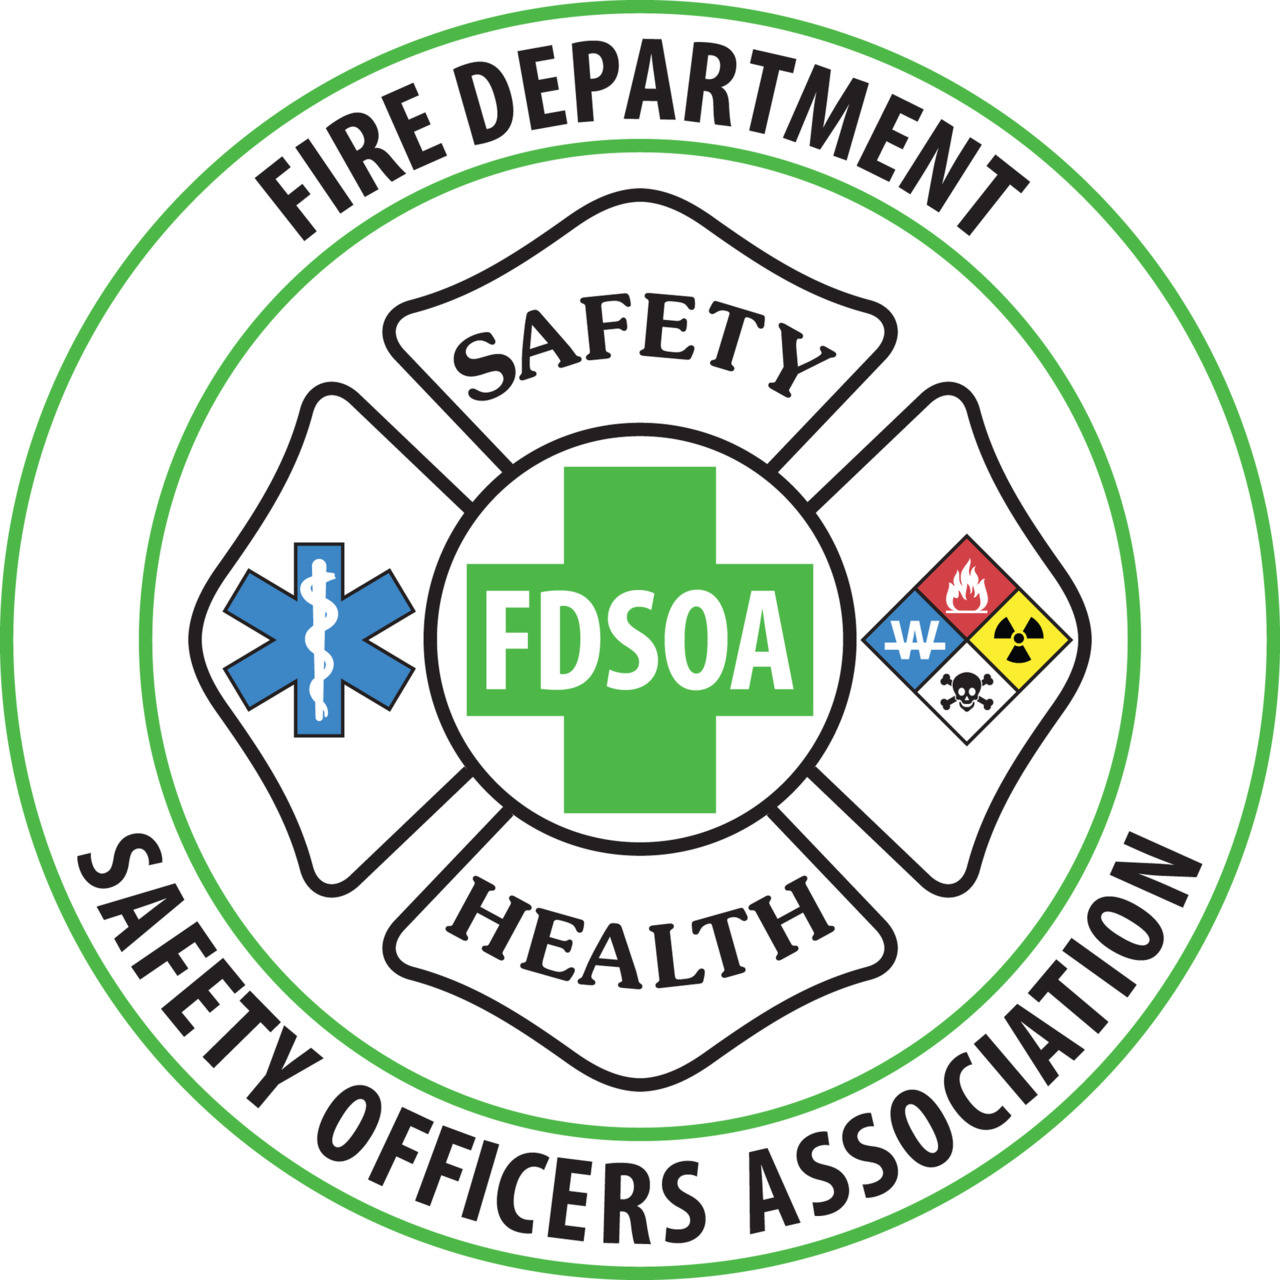 Fire Apparatus News - 2015 NFPA Standards 1901, 1906